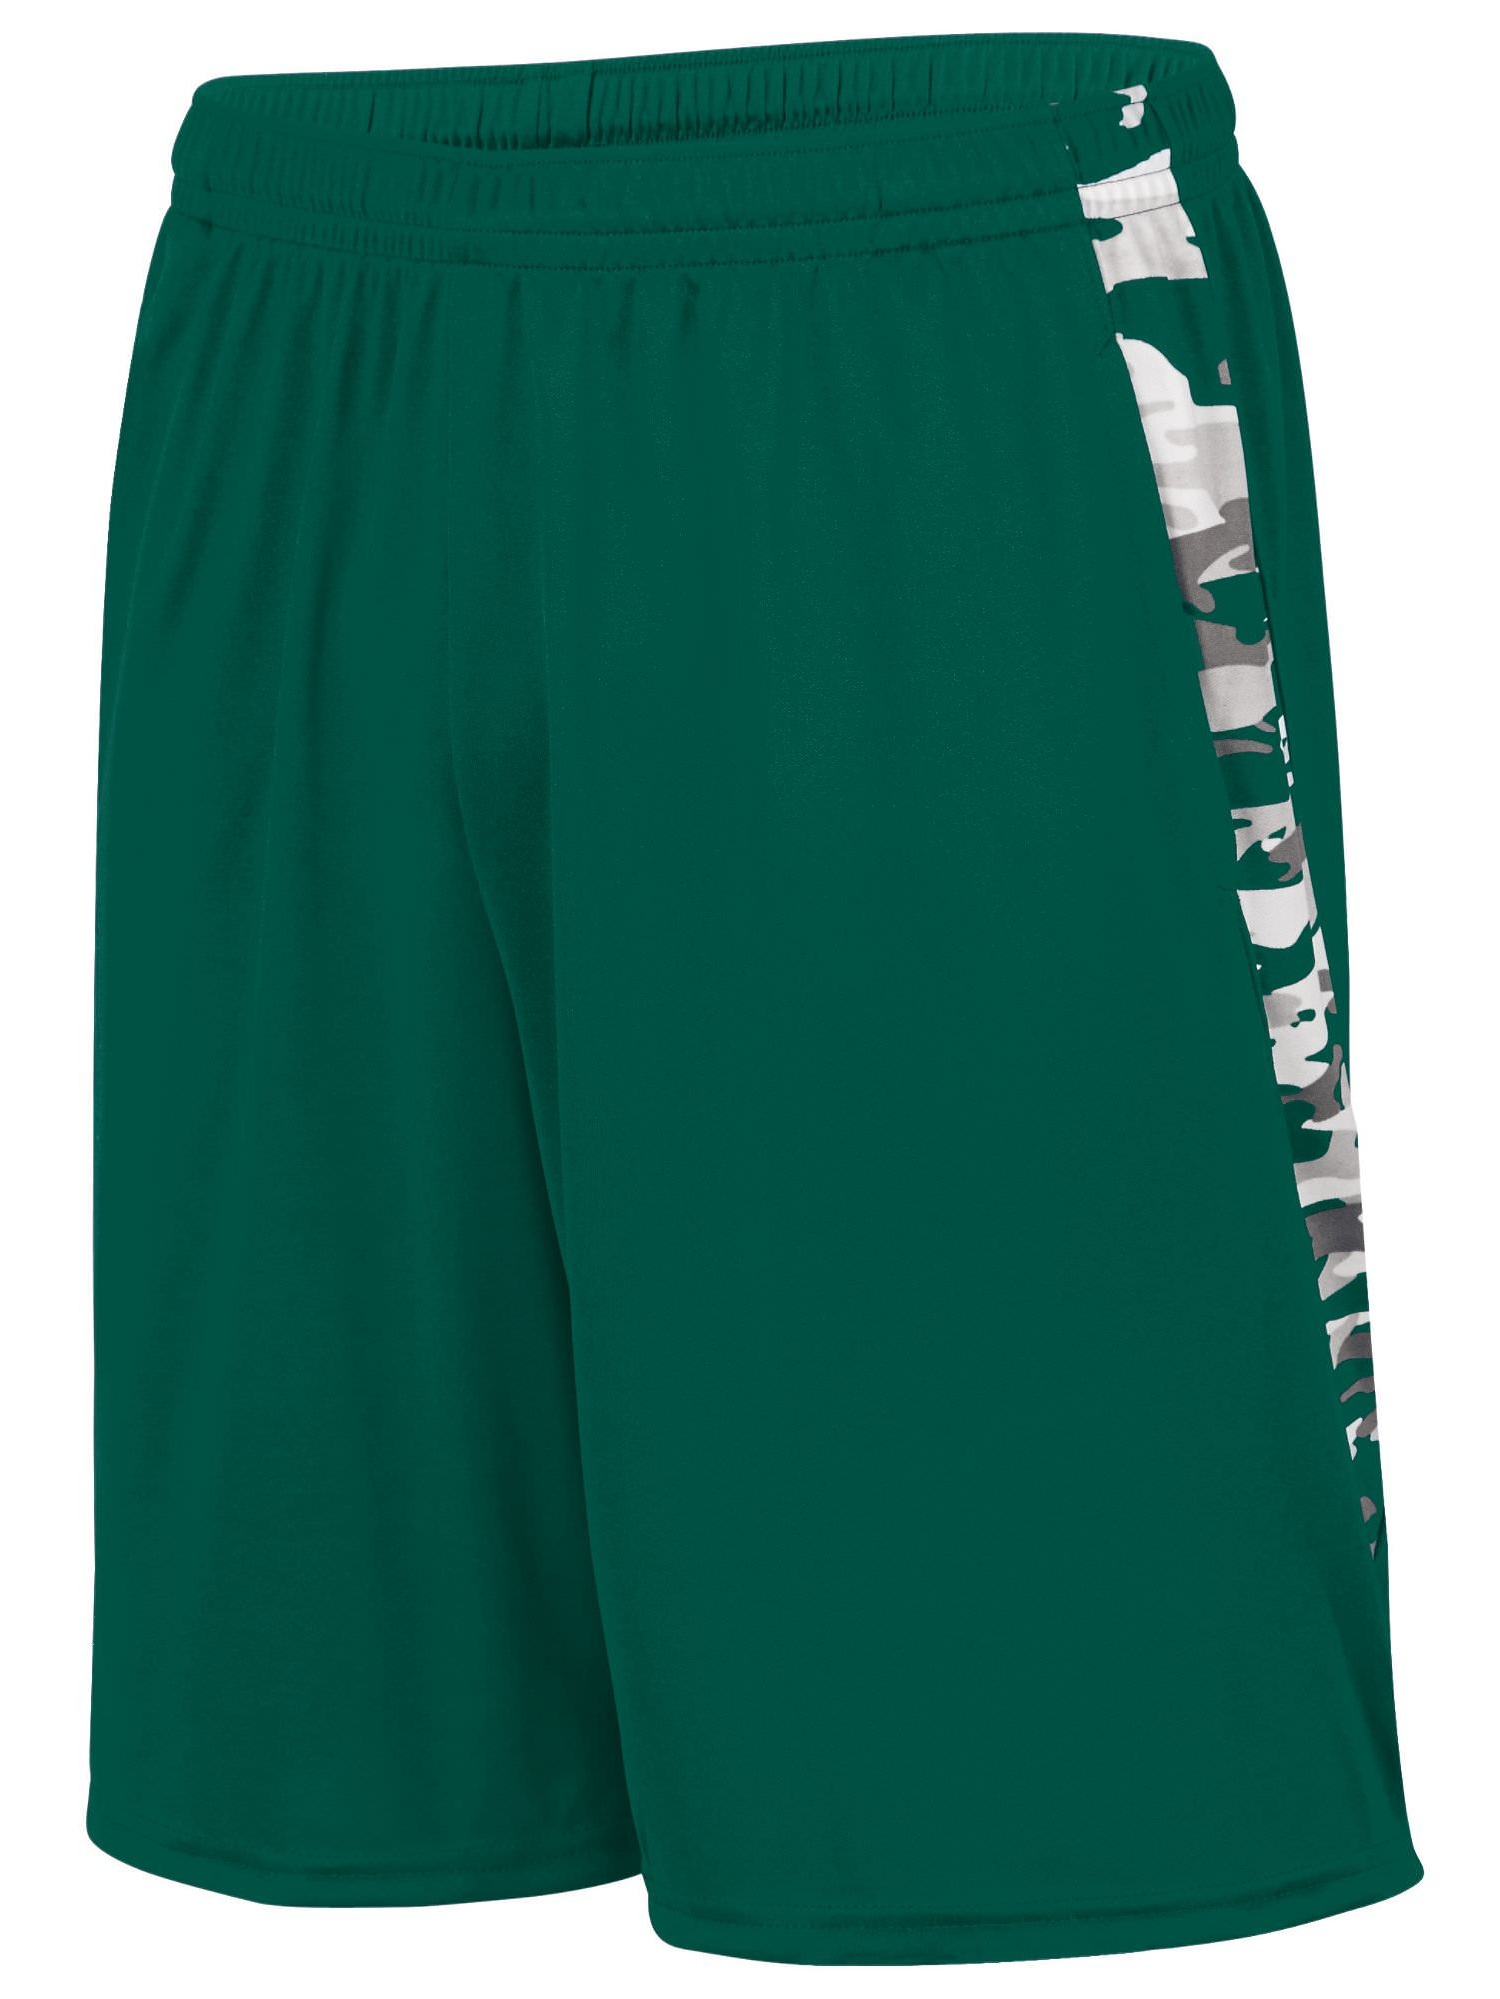 Augusta Sportswear Men's Mod Camo Training Short 1432